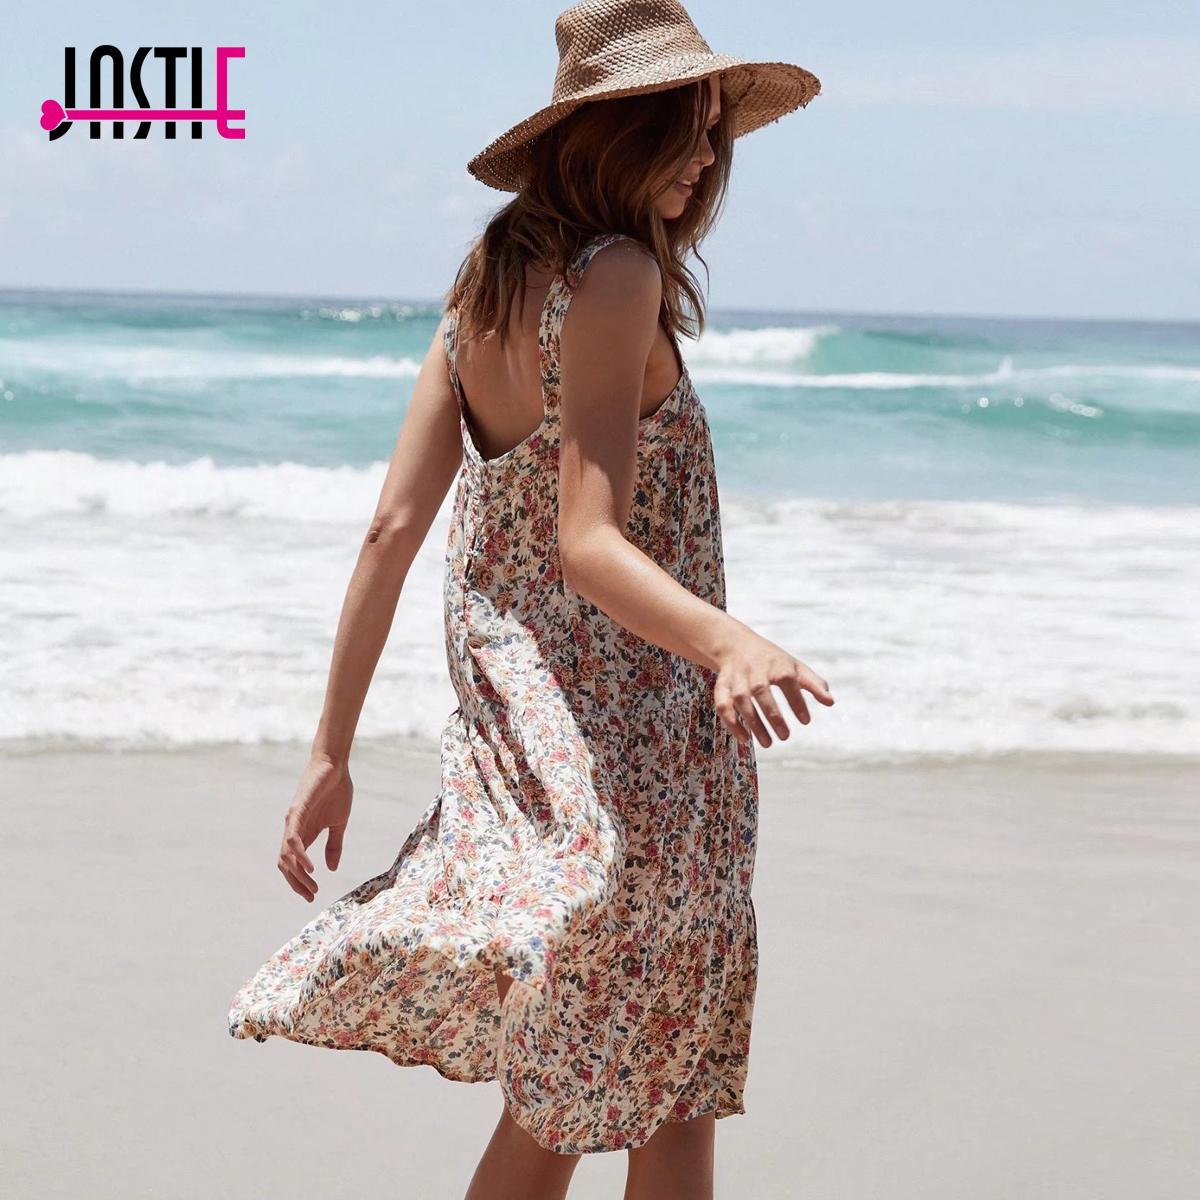 e7452c5ef0 Jastie 2018 Summer Women Dress Boho Vintage Floral Midi Dresses Casual  Beach Dress Party Dresses Vestidos Female Clothing J190505